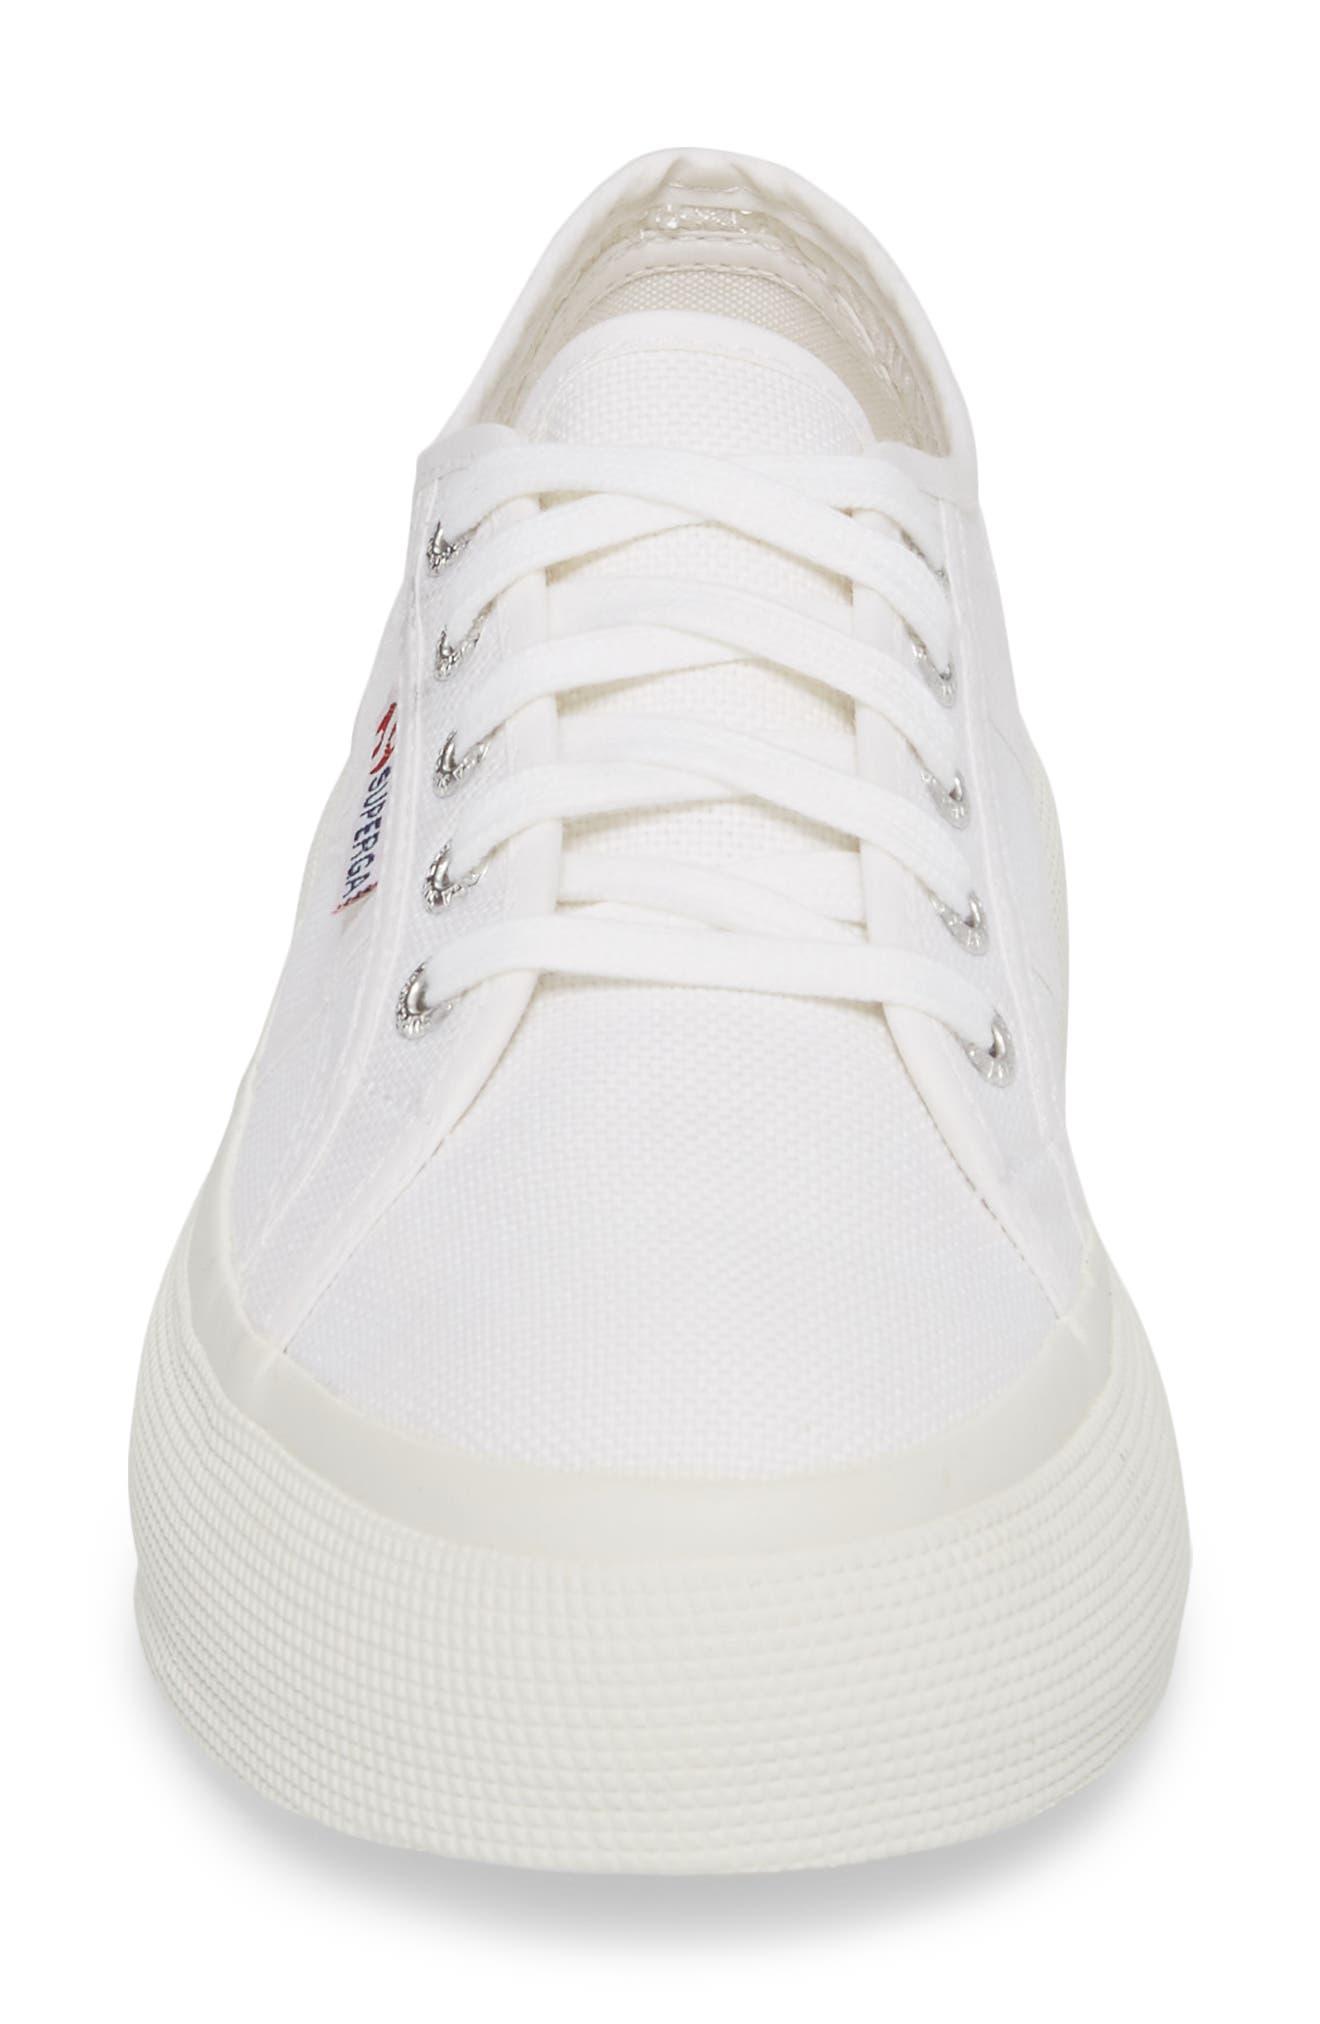 2287 Cotu Platform Sneaker,                             Alternate thumbnail 4, color,                             White